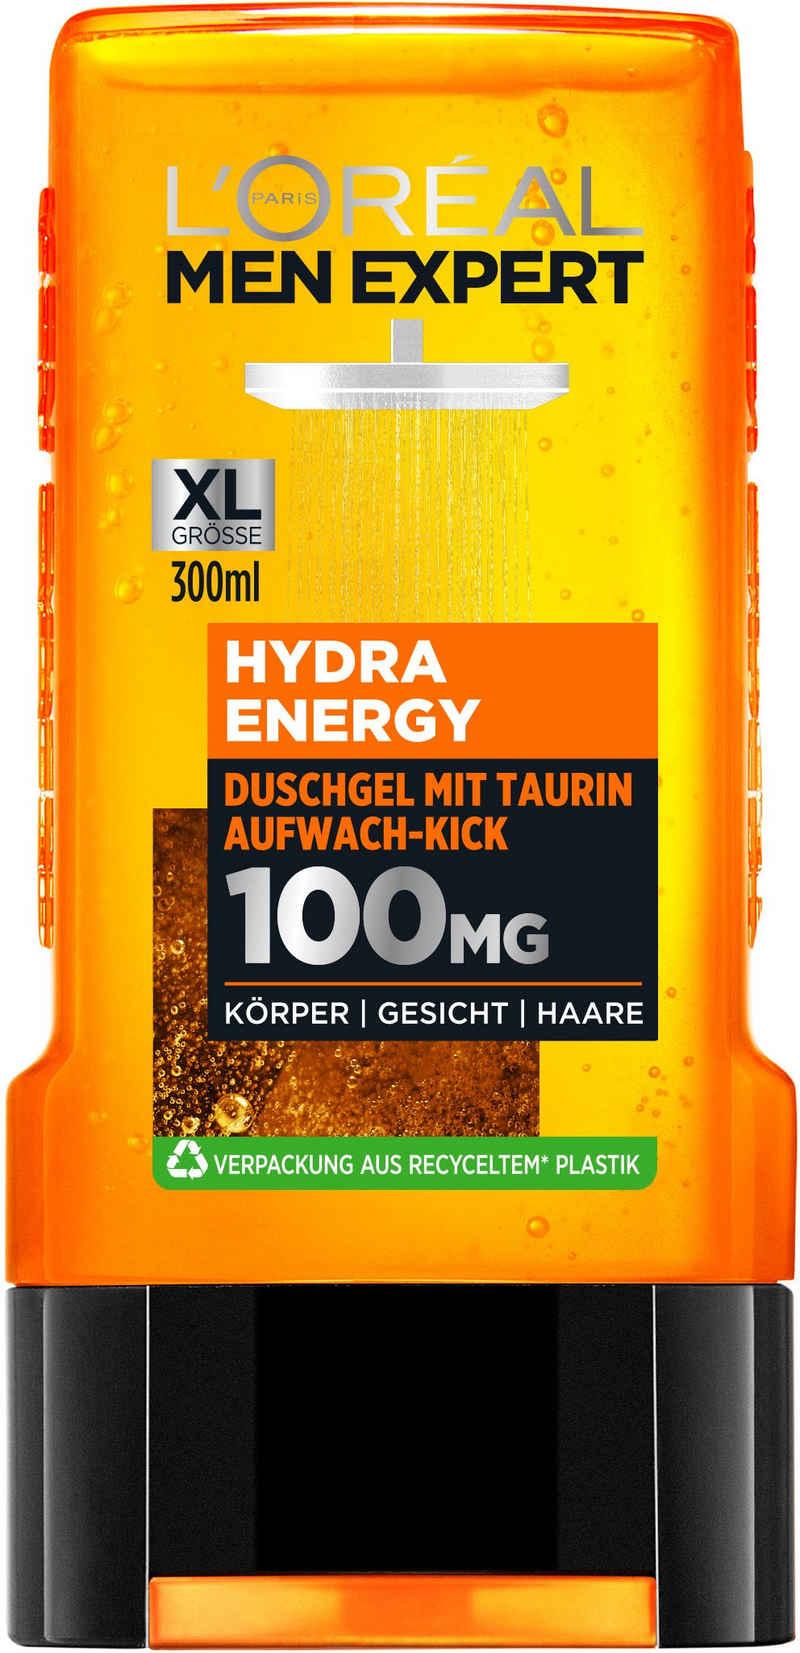 L'ORÉAL PARIS MEN EXPERT Duschgel »Hydra Energy«